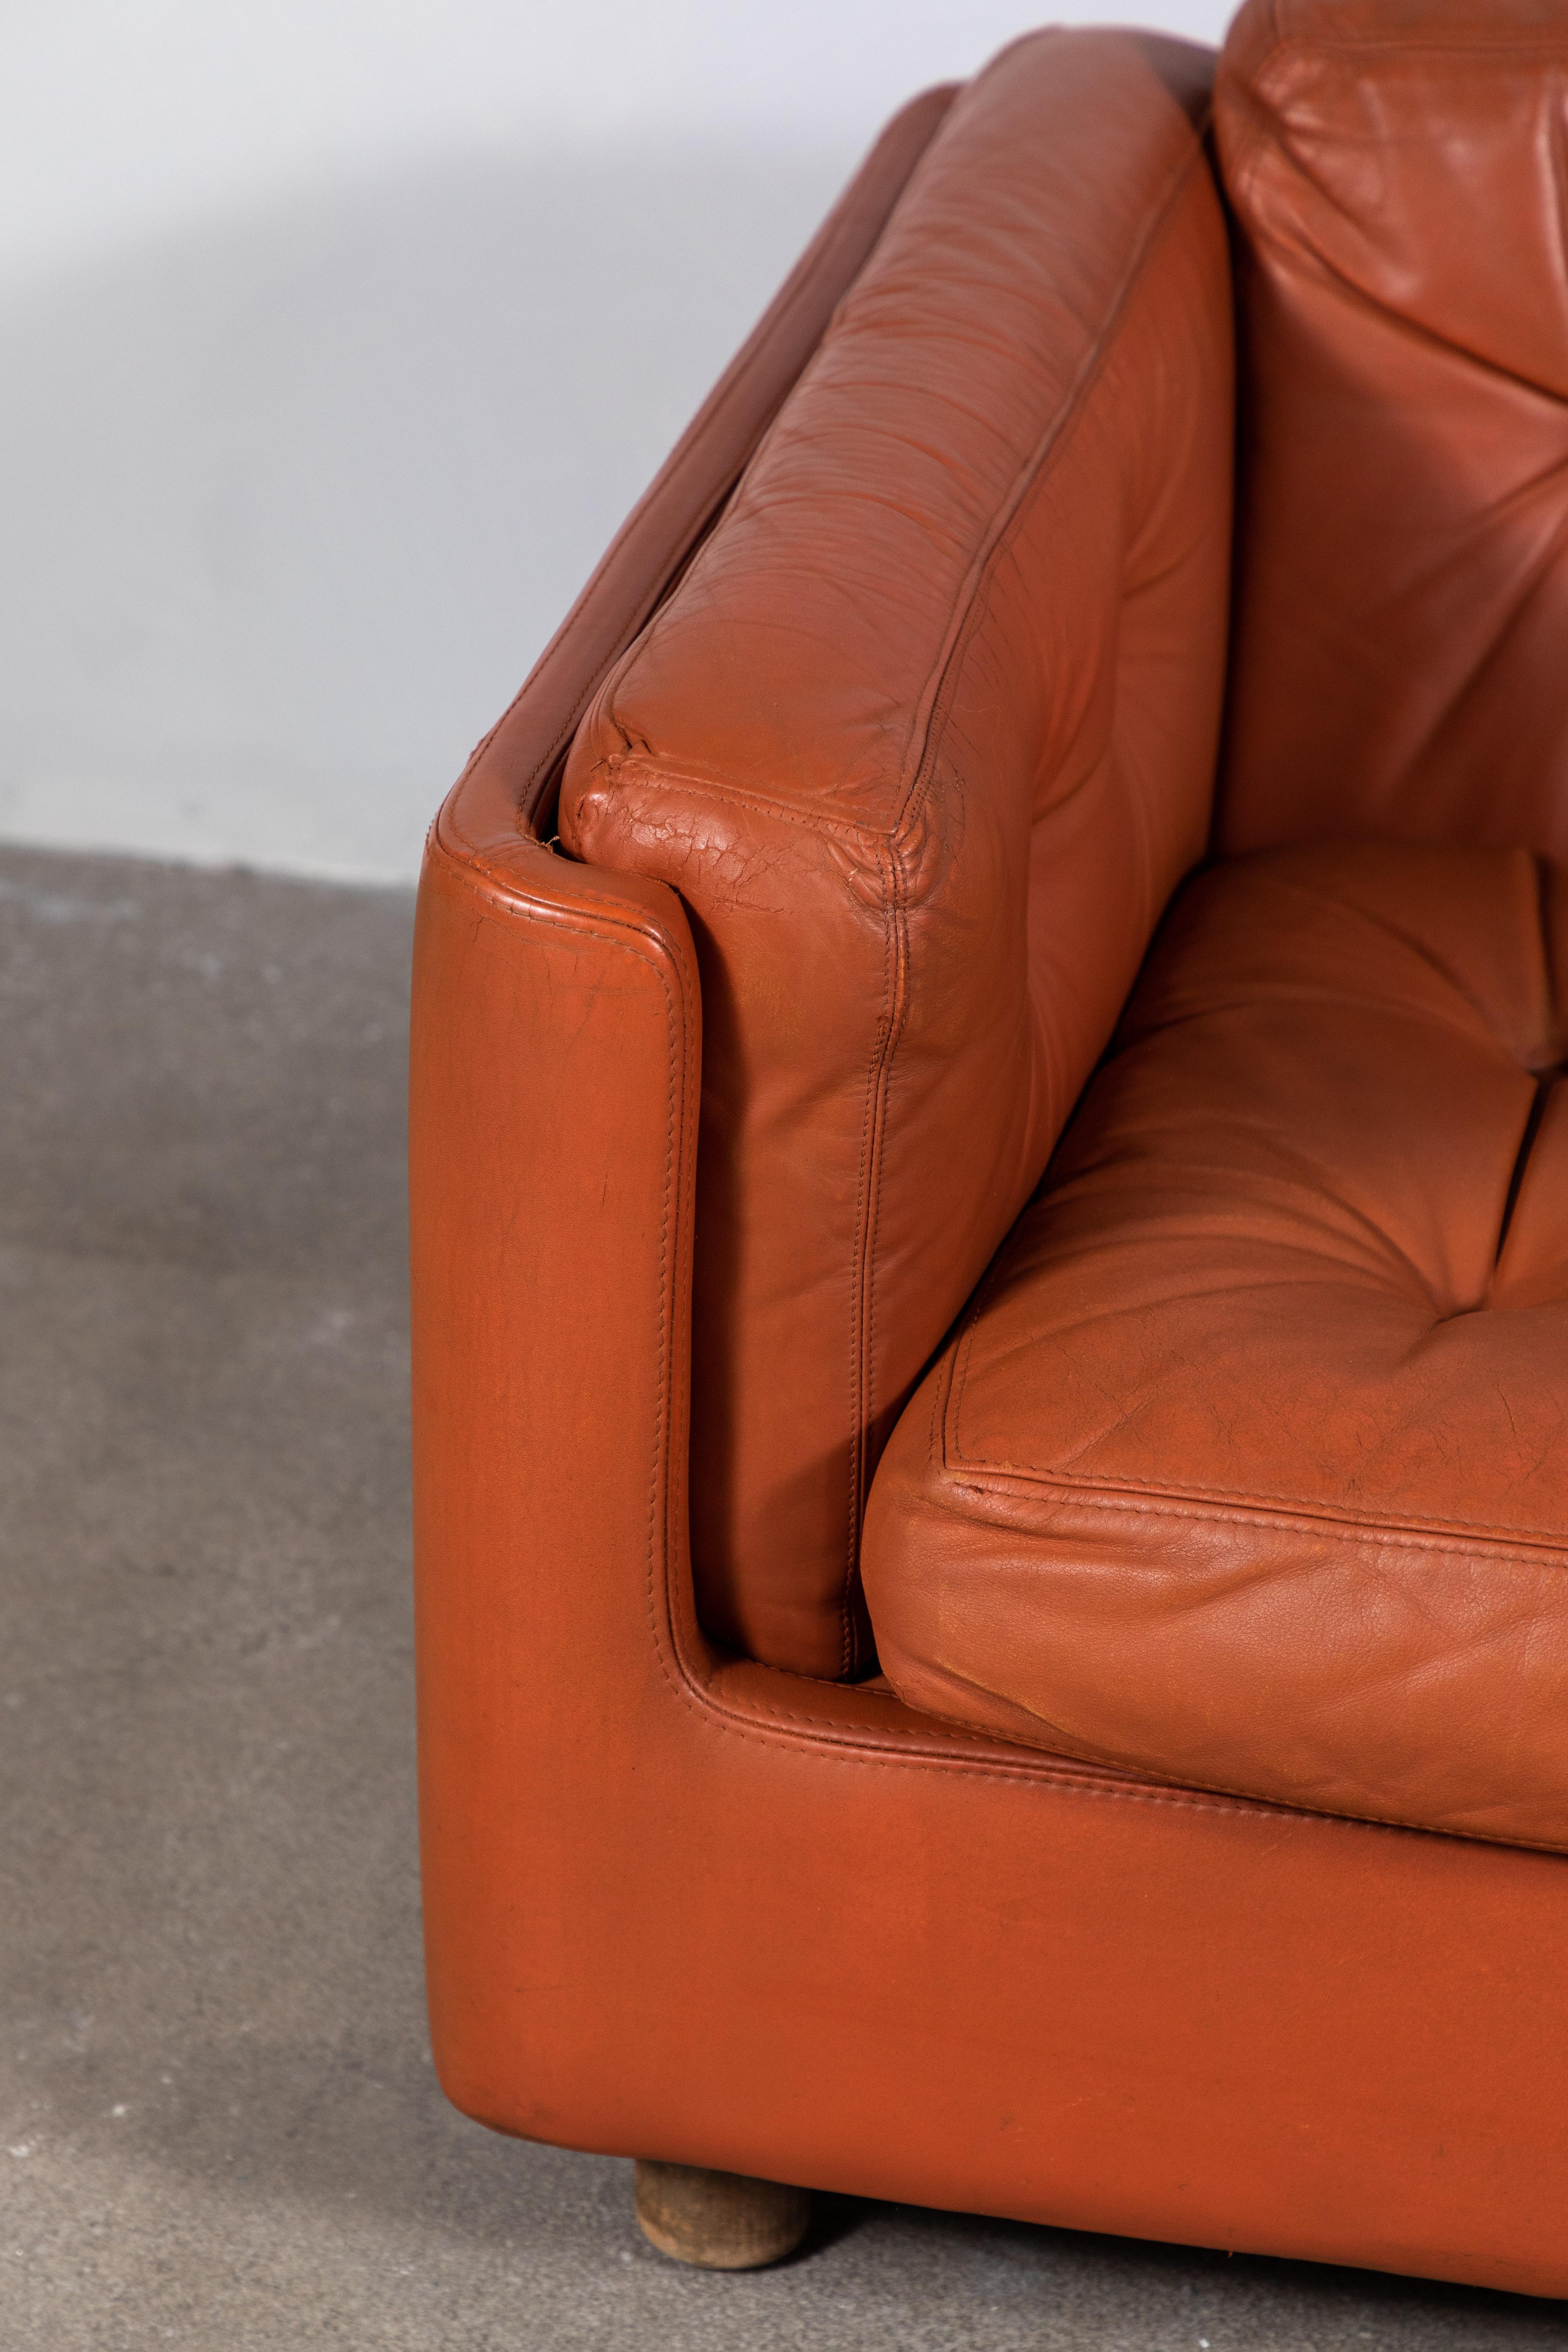 Italian Low Leather Modern Sofa With Curved Corners By Zanotta